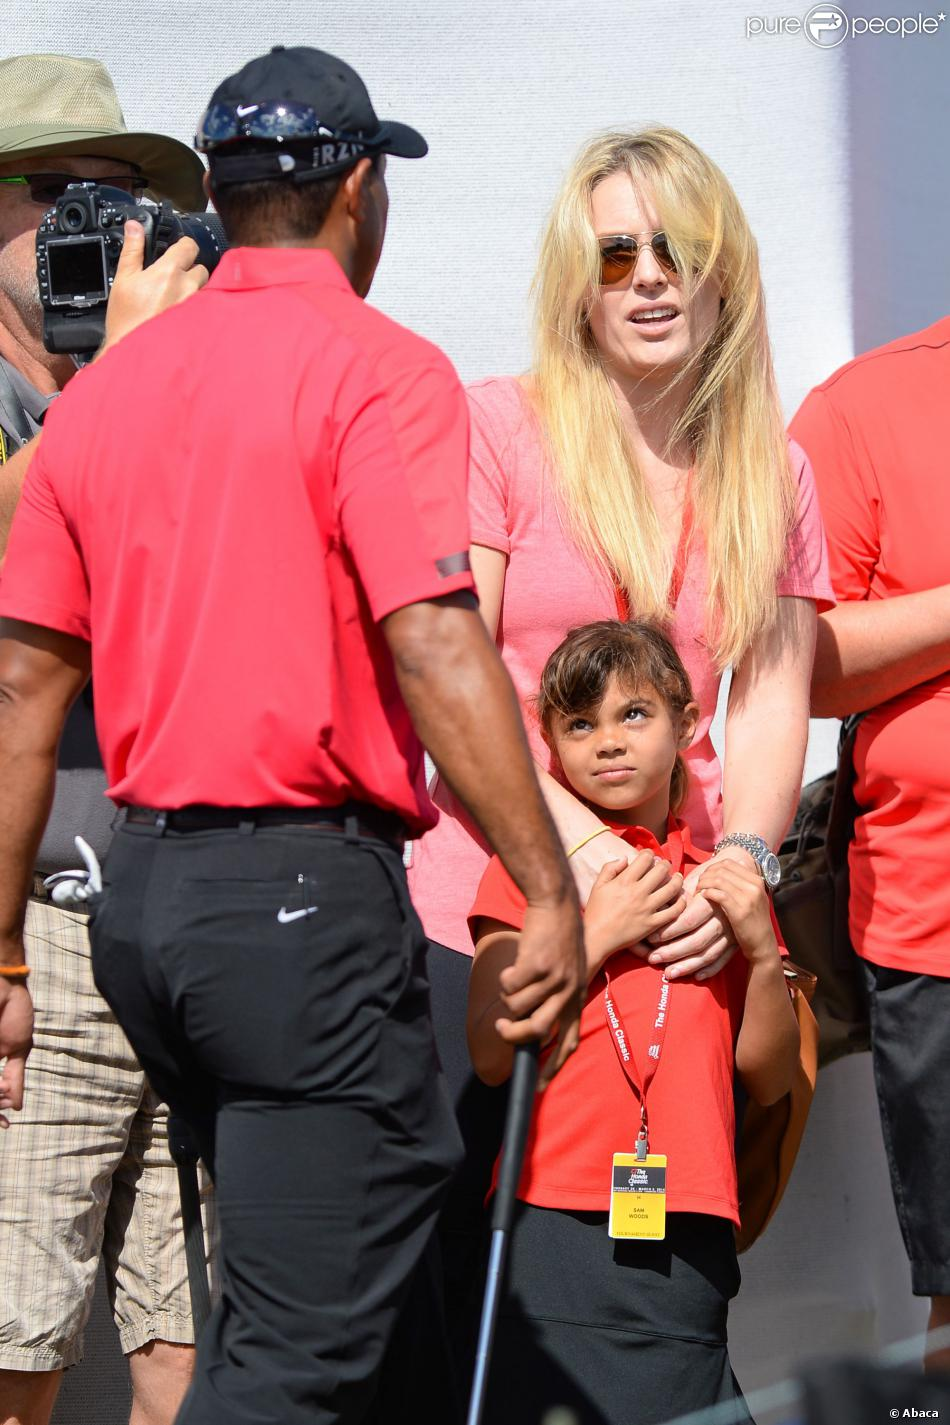 Tiger Woods, sa fille Sam Alexis Woods et Lindsey Vonn lors du dernier tour du tournoi Honda Classic au PGA National Resort and Spa dePalm Beach Gardens, le 2 mars 2014